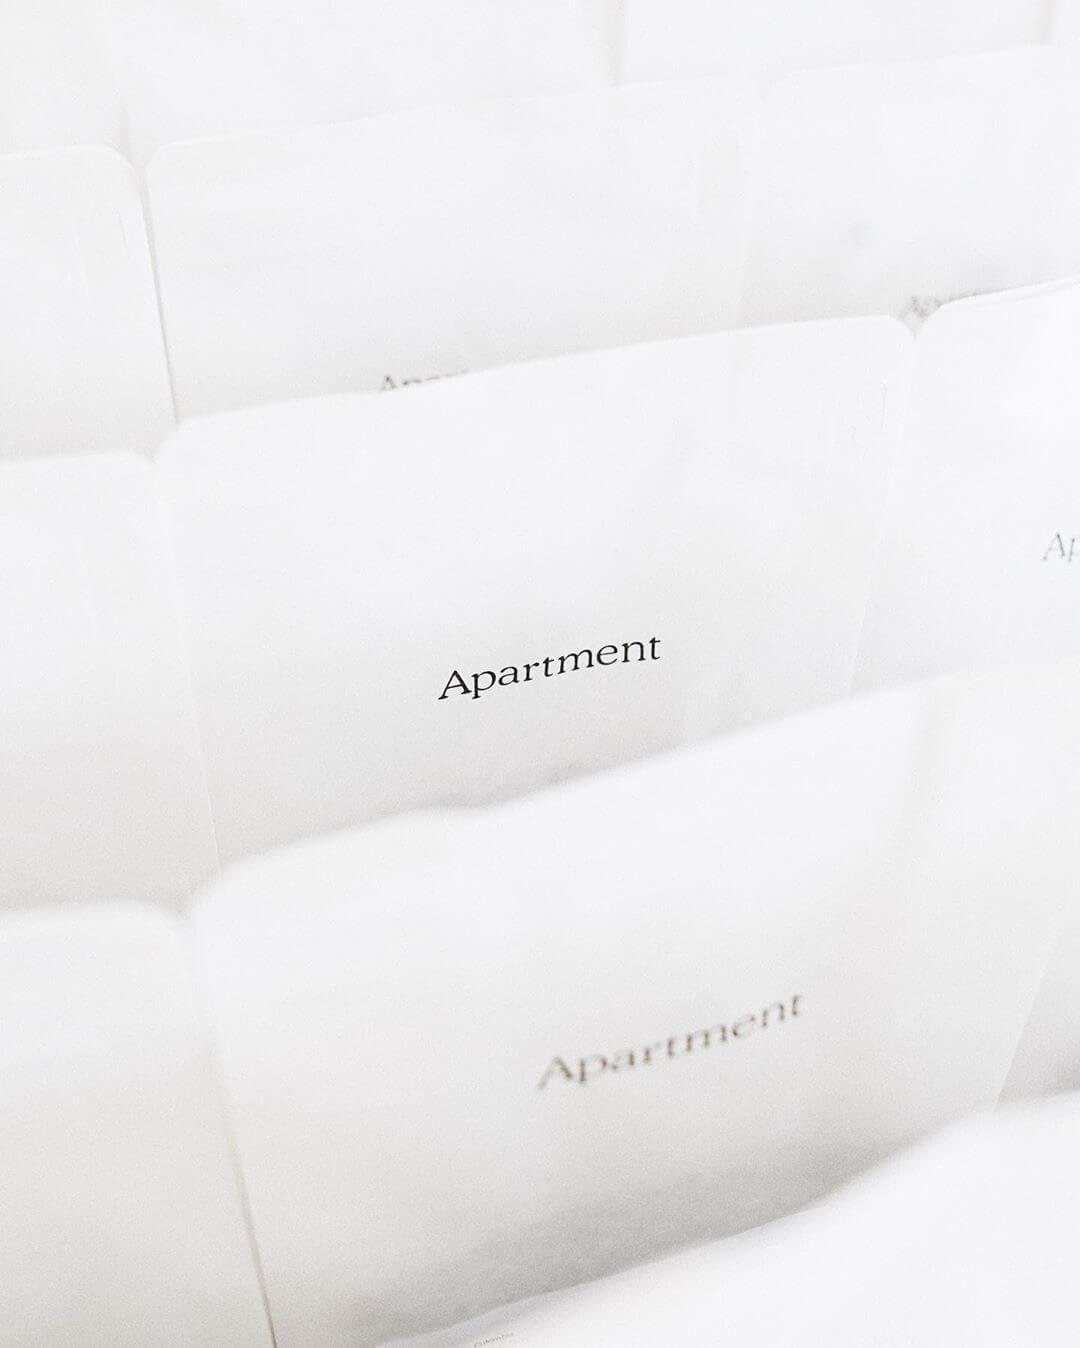 Apartment Coffee retail bag